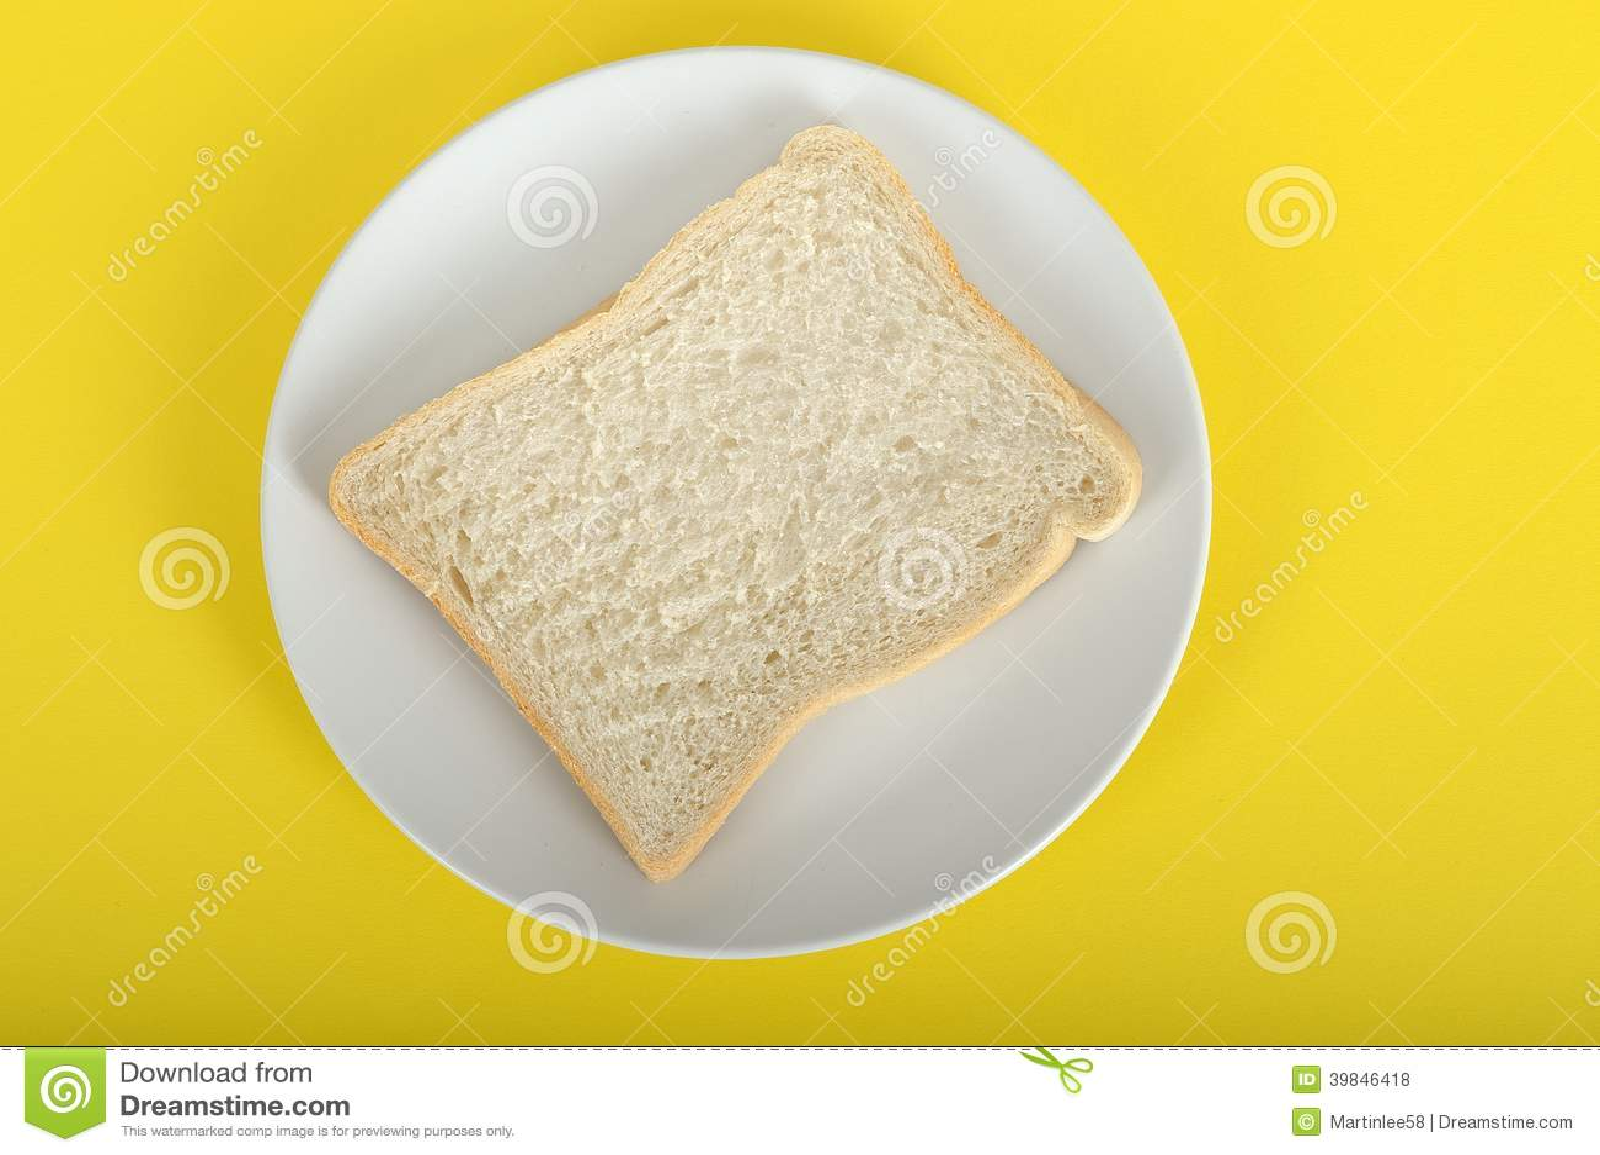 Slice Of Bread Stock Photo - Image: 39846418